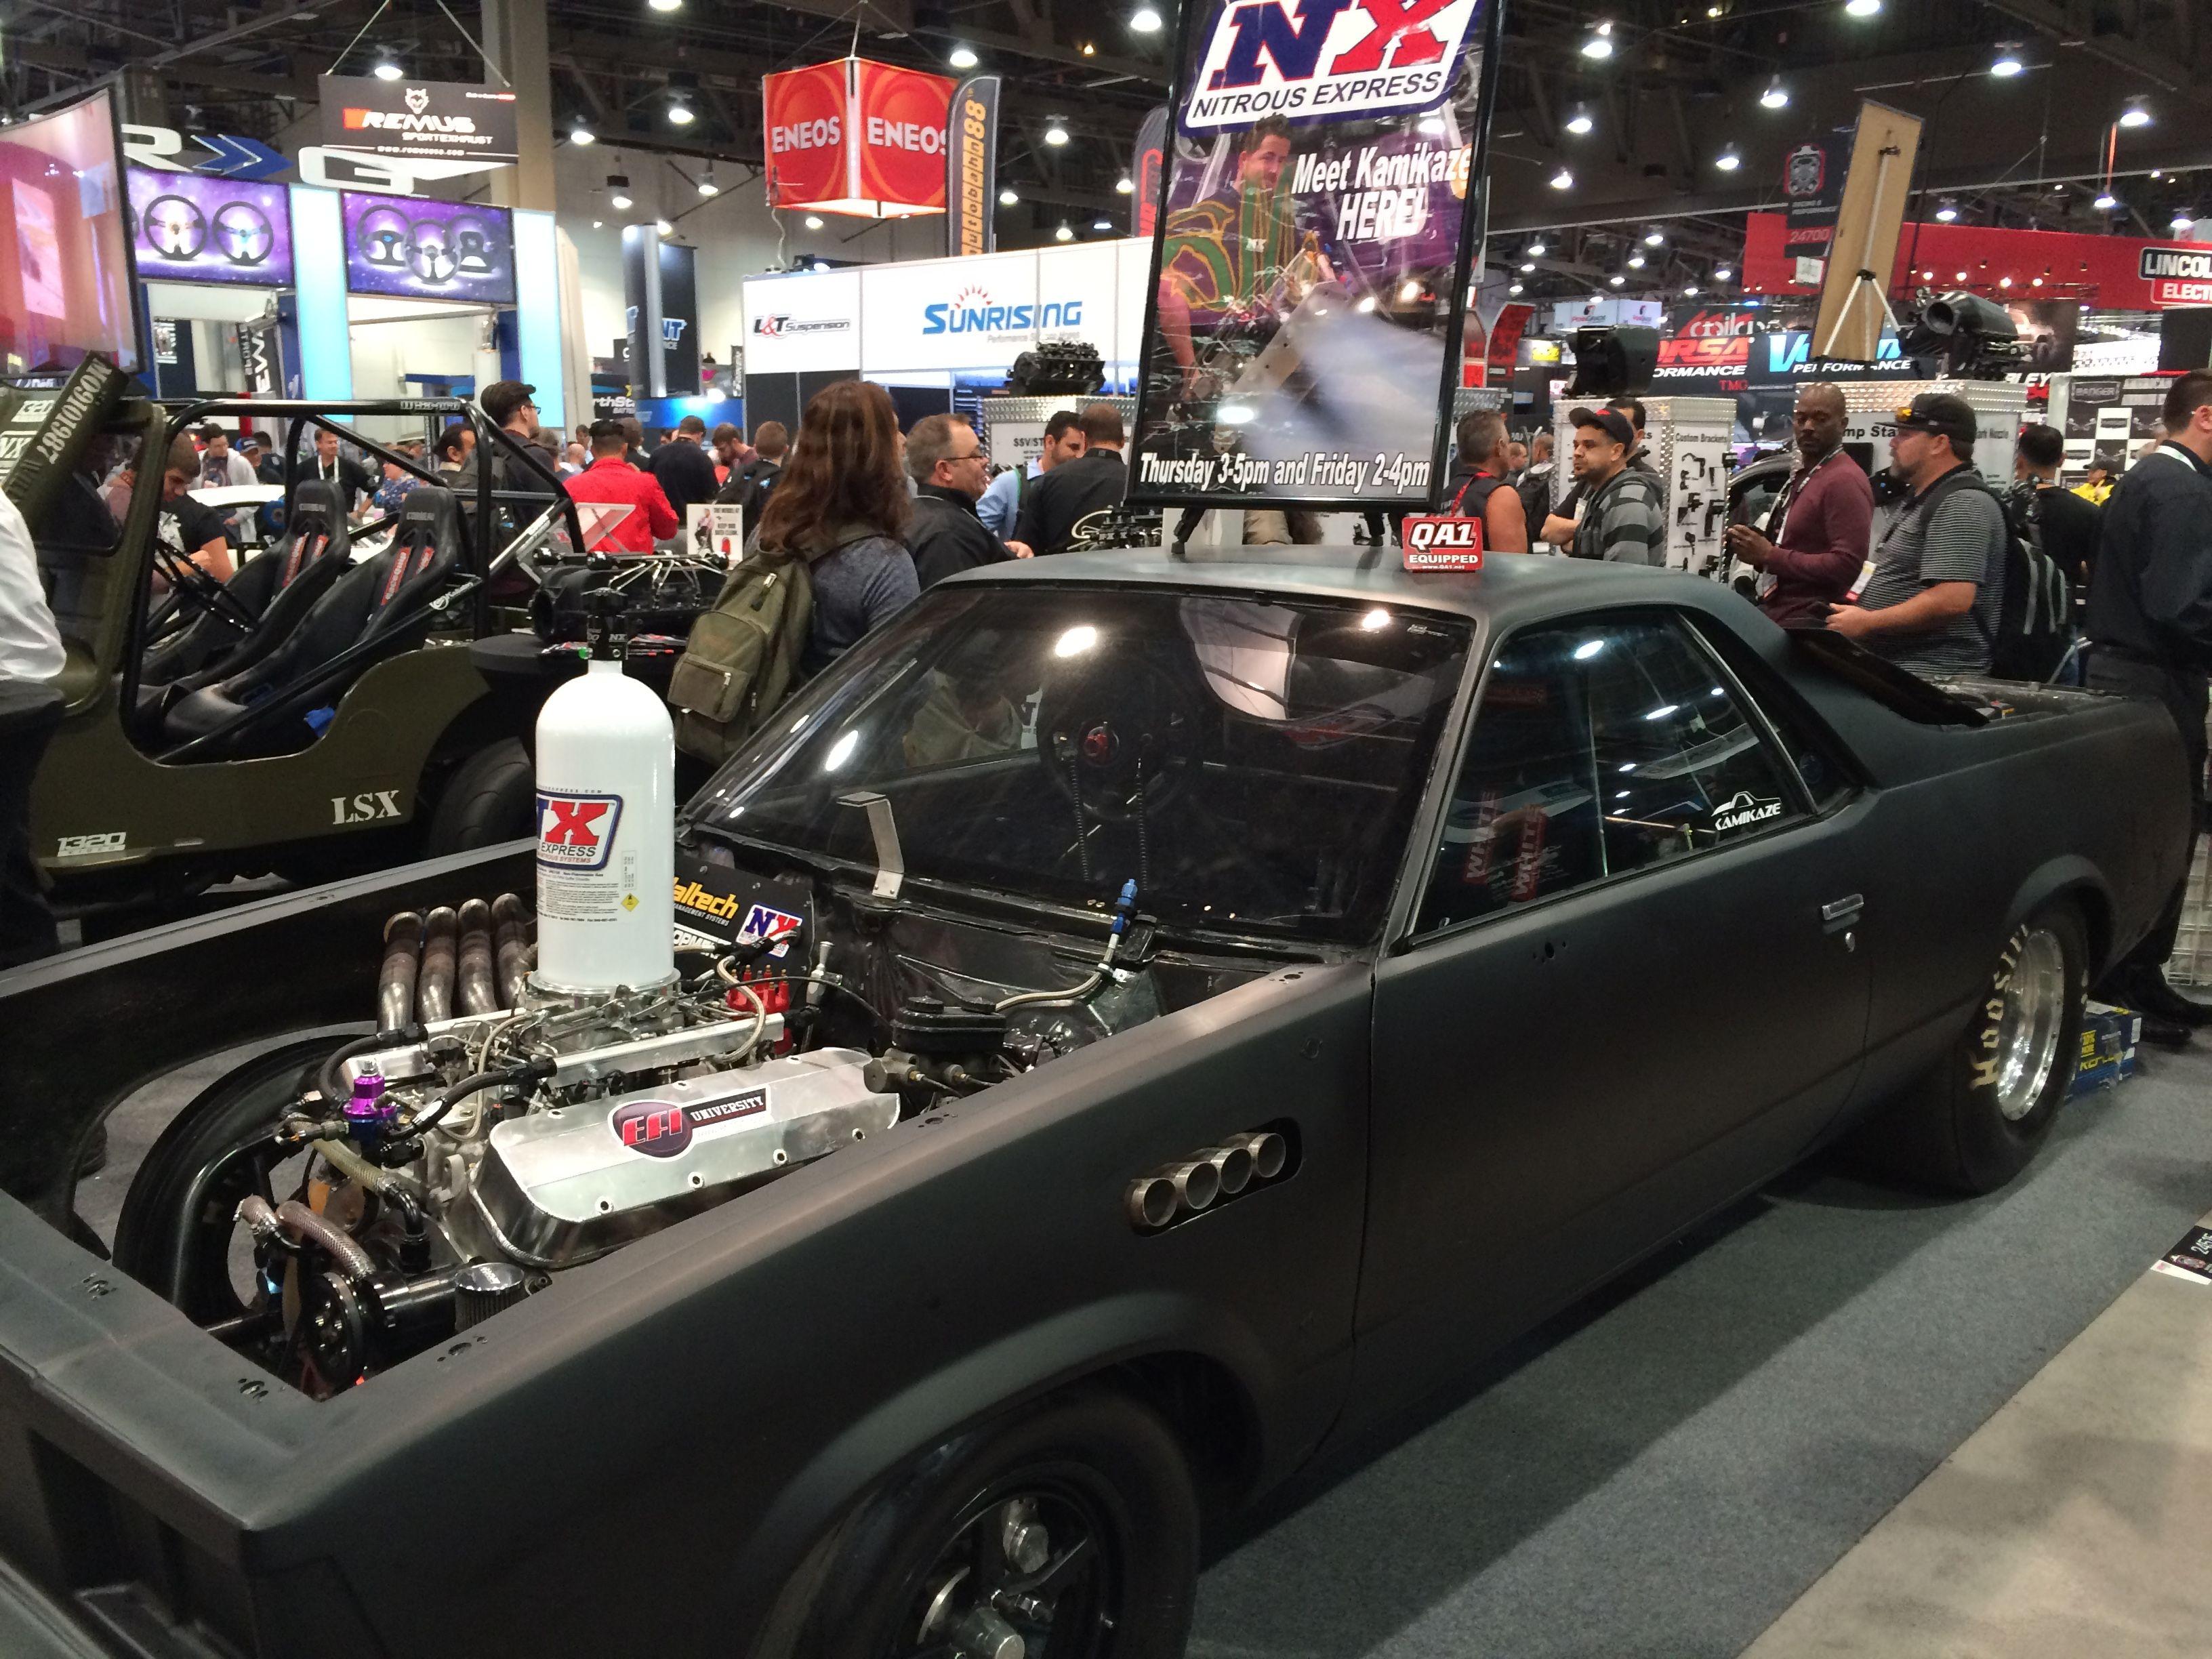 Sema Las Vegas 2015 Street Outlaw\'s car | SEMA LAS VEGAS 2015 ...